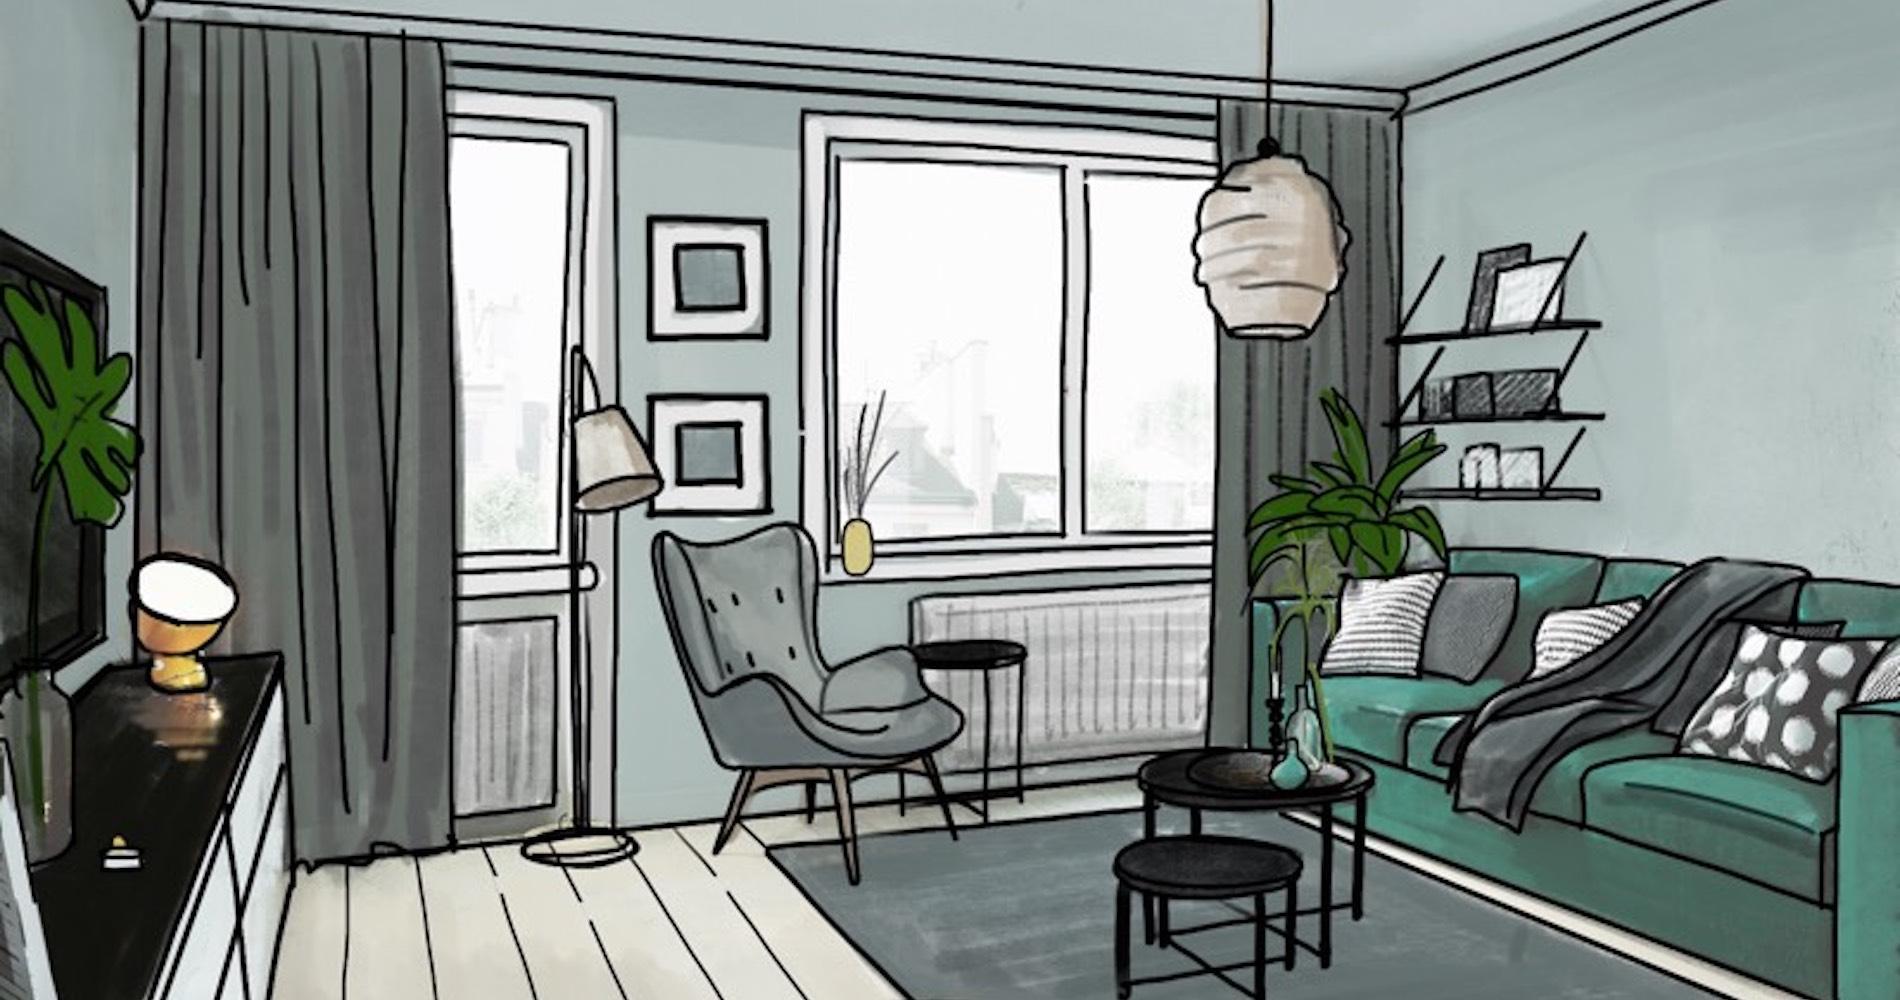 comment cr er un coin nuit dans un grand studio madame figaro. Black Bedroom Furniture Sets. Home Design Ideas